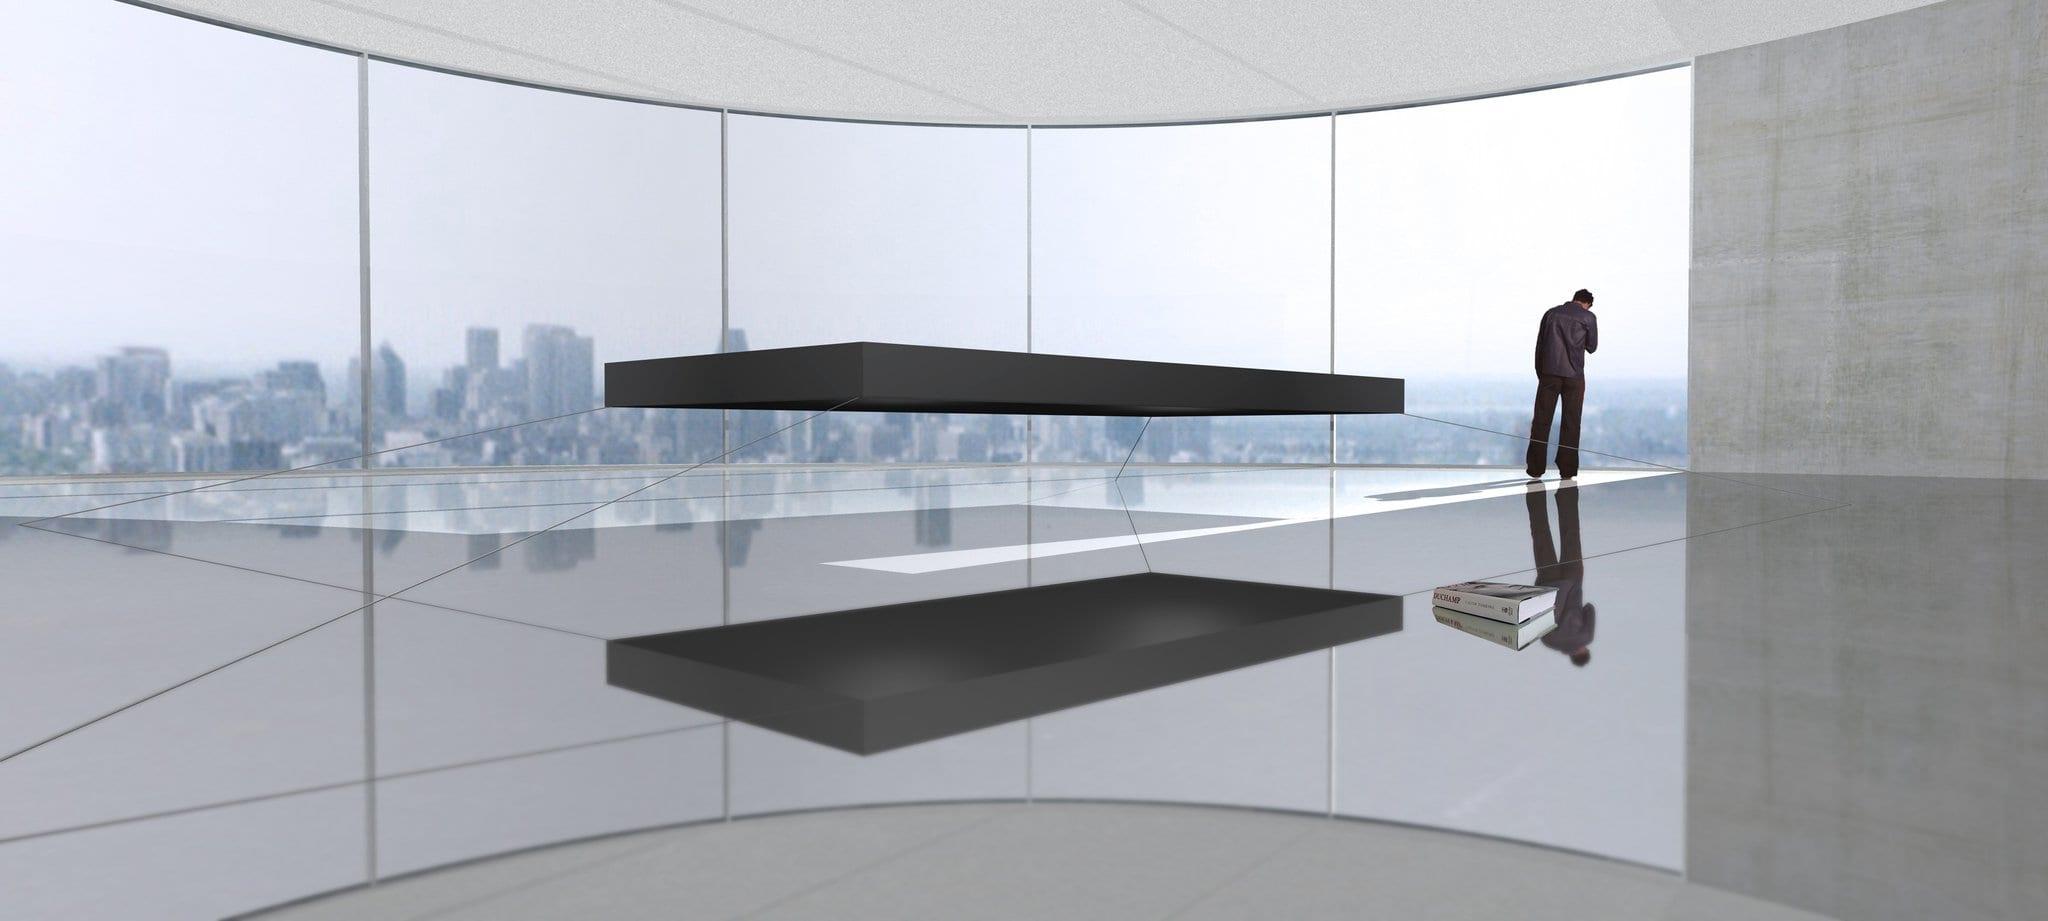 Most Expensive Furniture Brands   Ruijssenaars Magnetic Floating Bed